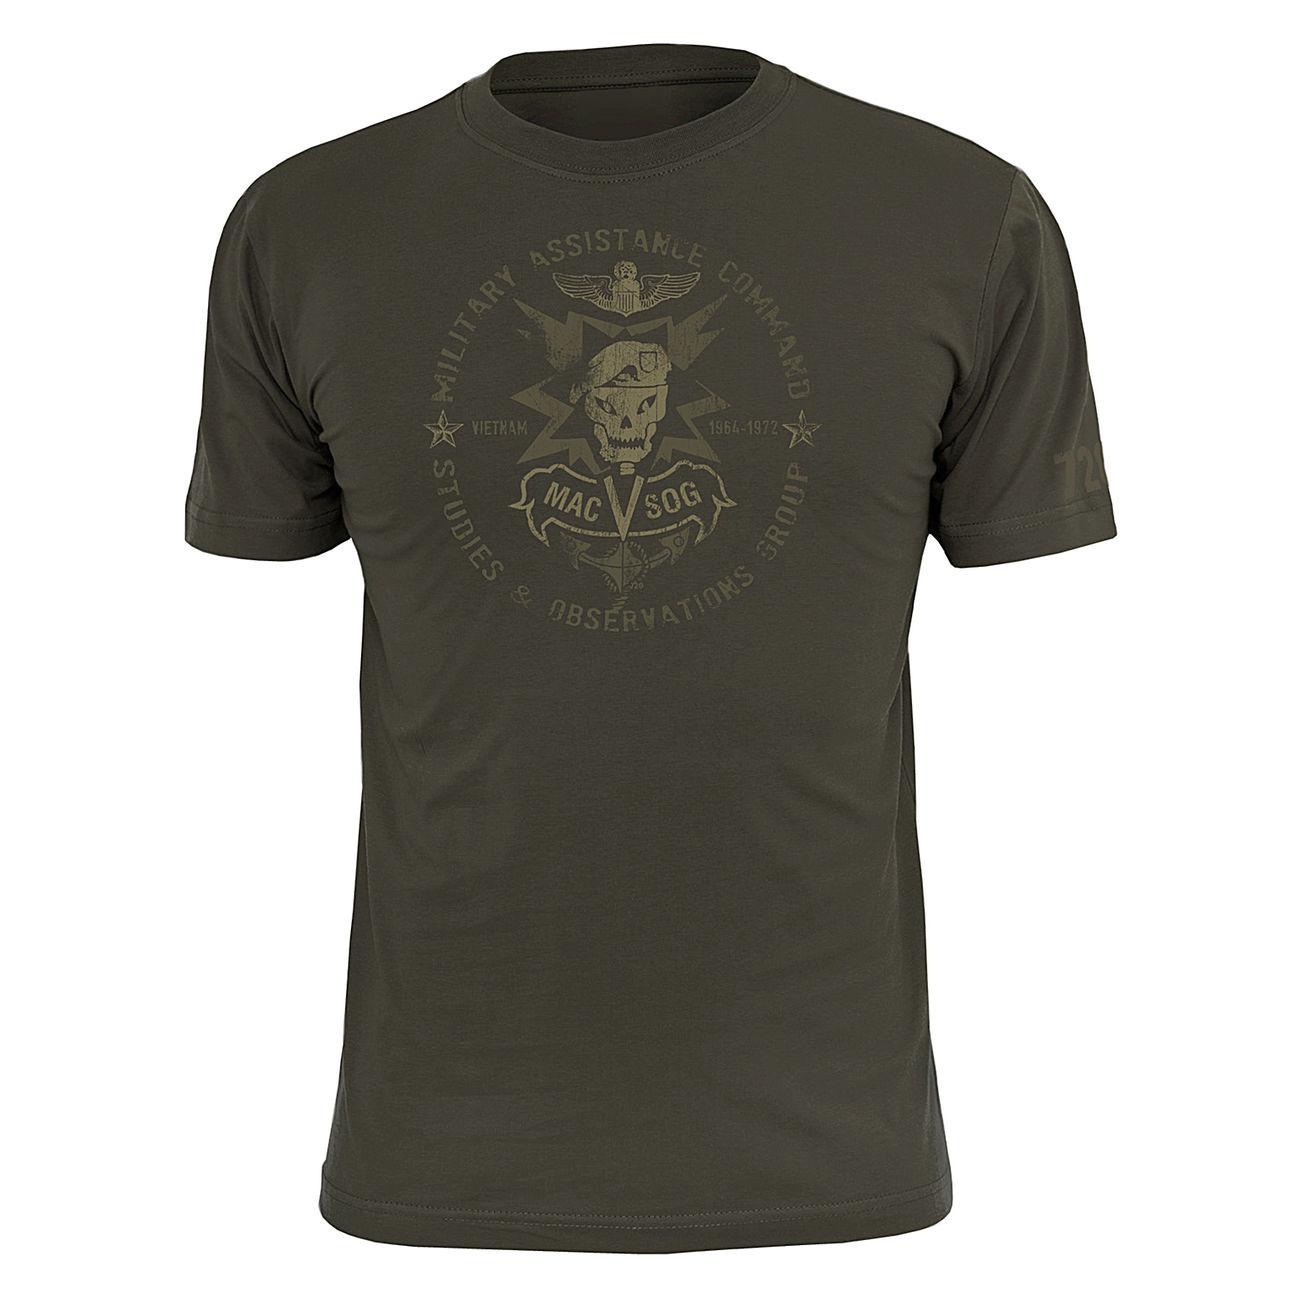 720gear T-Shirt MACVSOG Vietnam günstig kaufen - Kotte ...